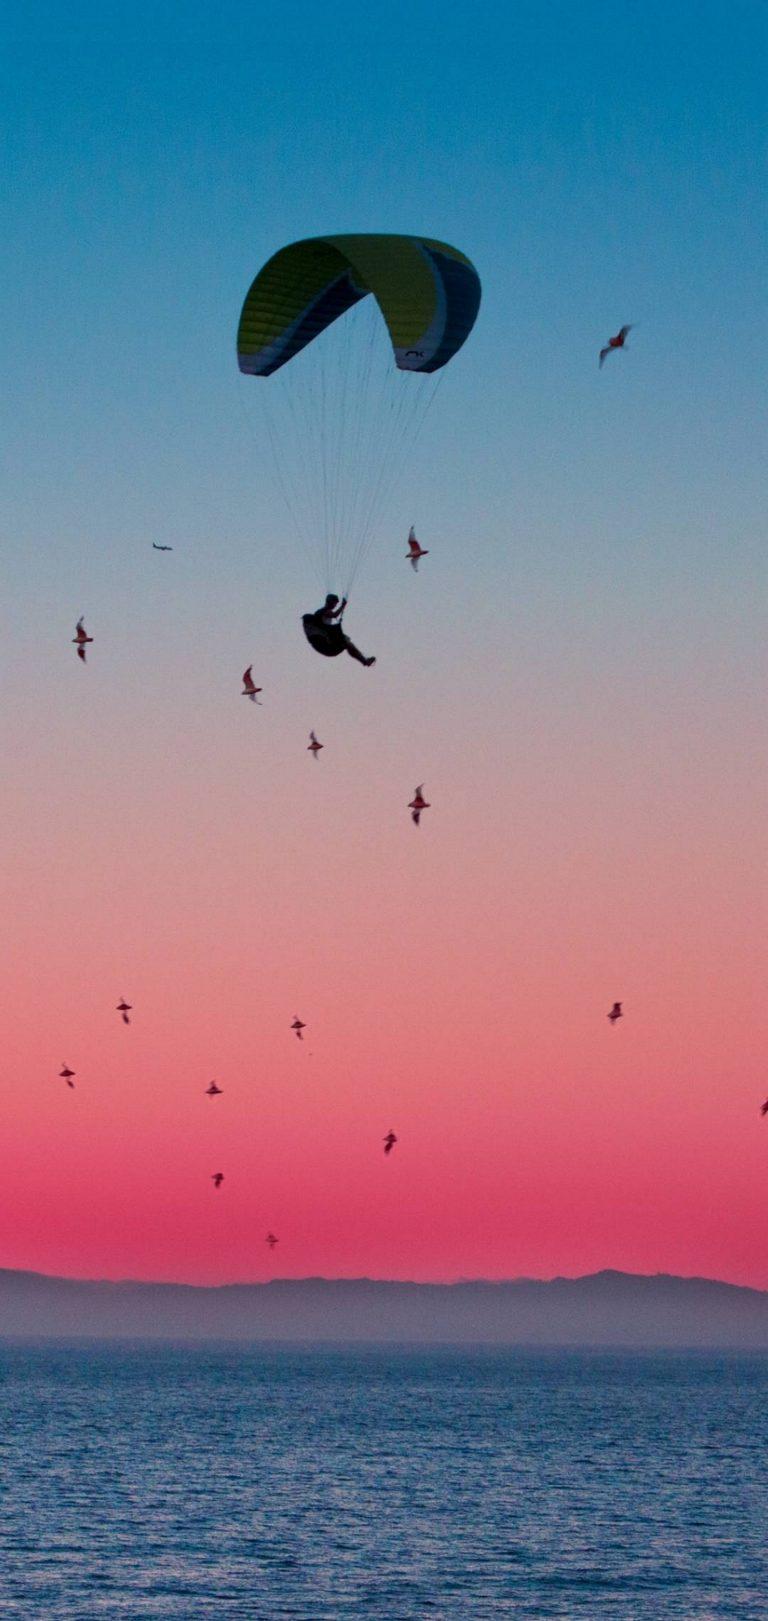 Parachute Flight Sports Wallpaper 1440x3040 768x1621